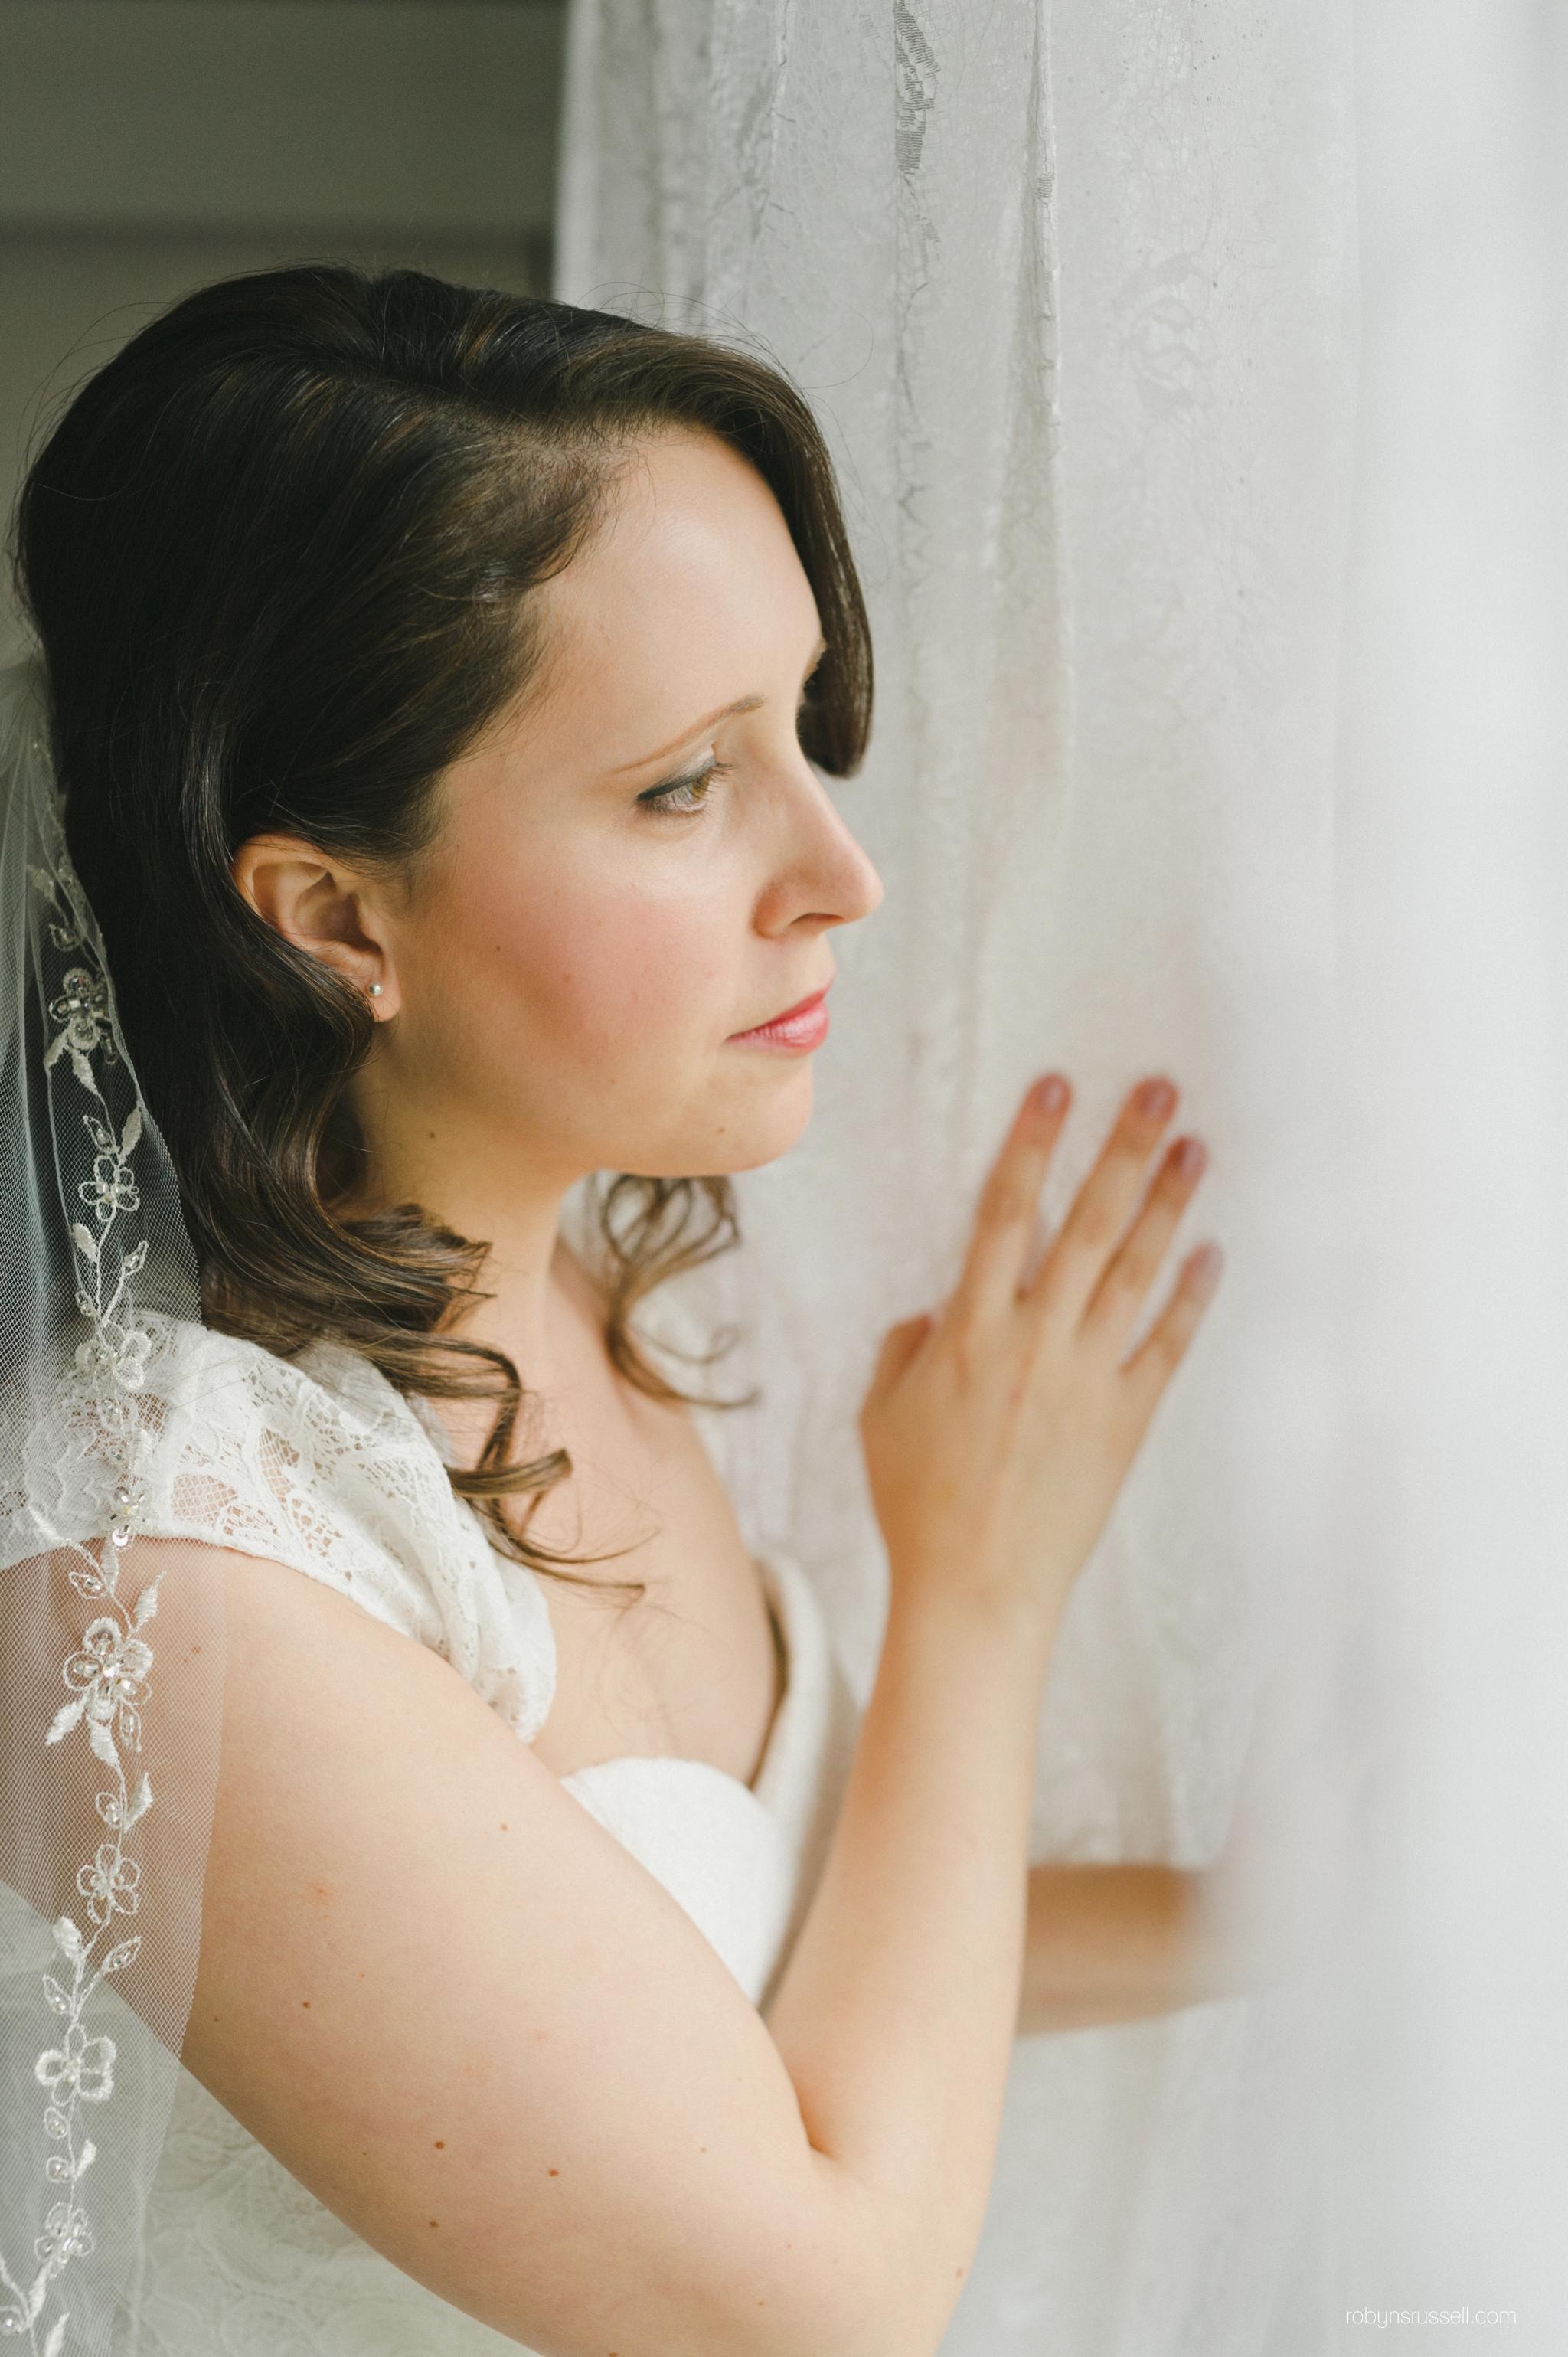 11-stunning-bride-to-be-on-wedding-day.jpg